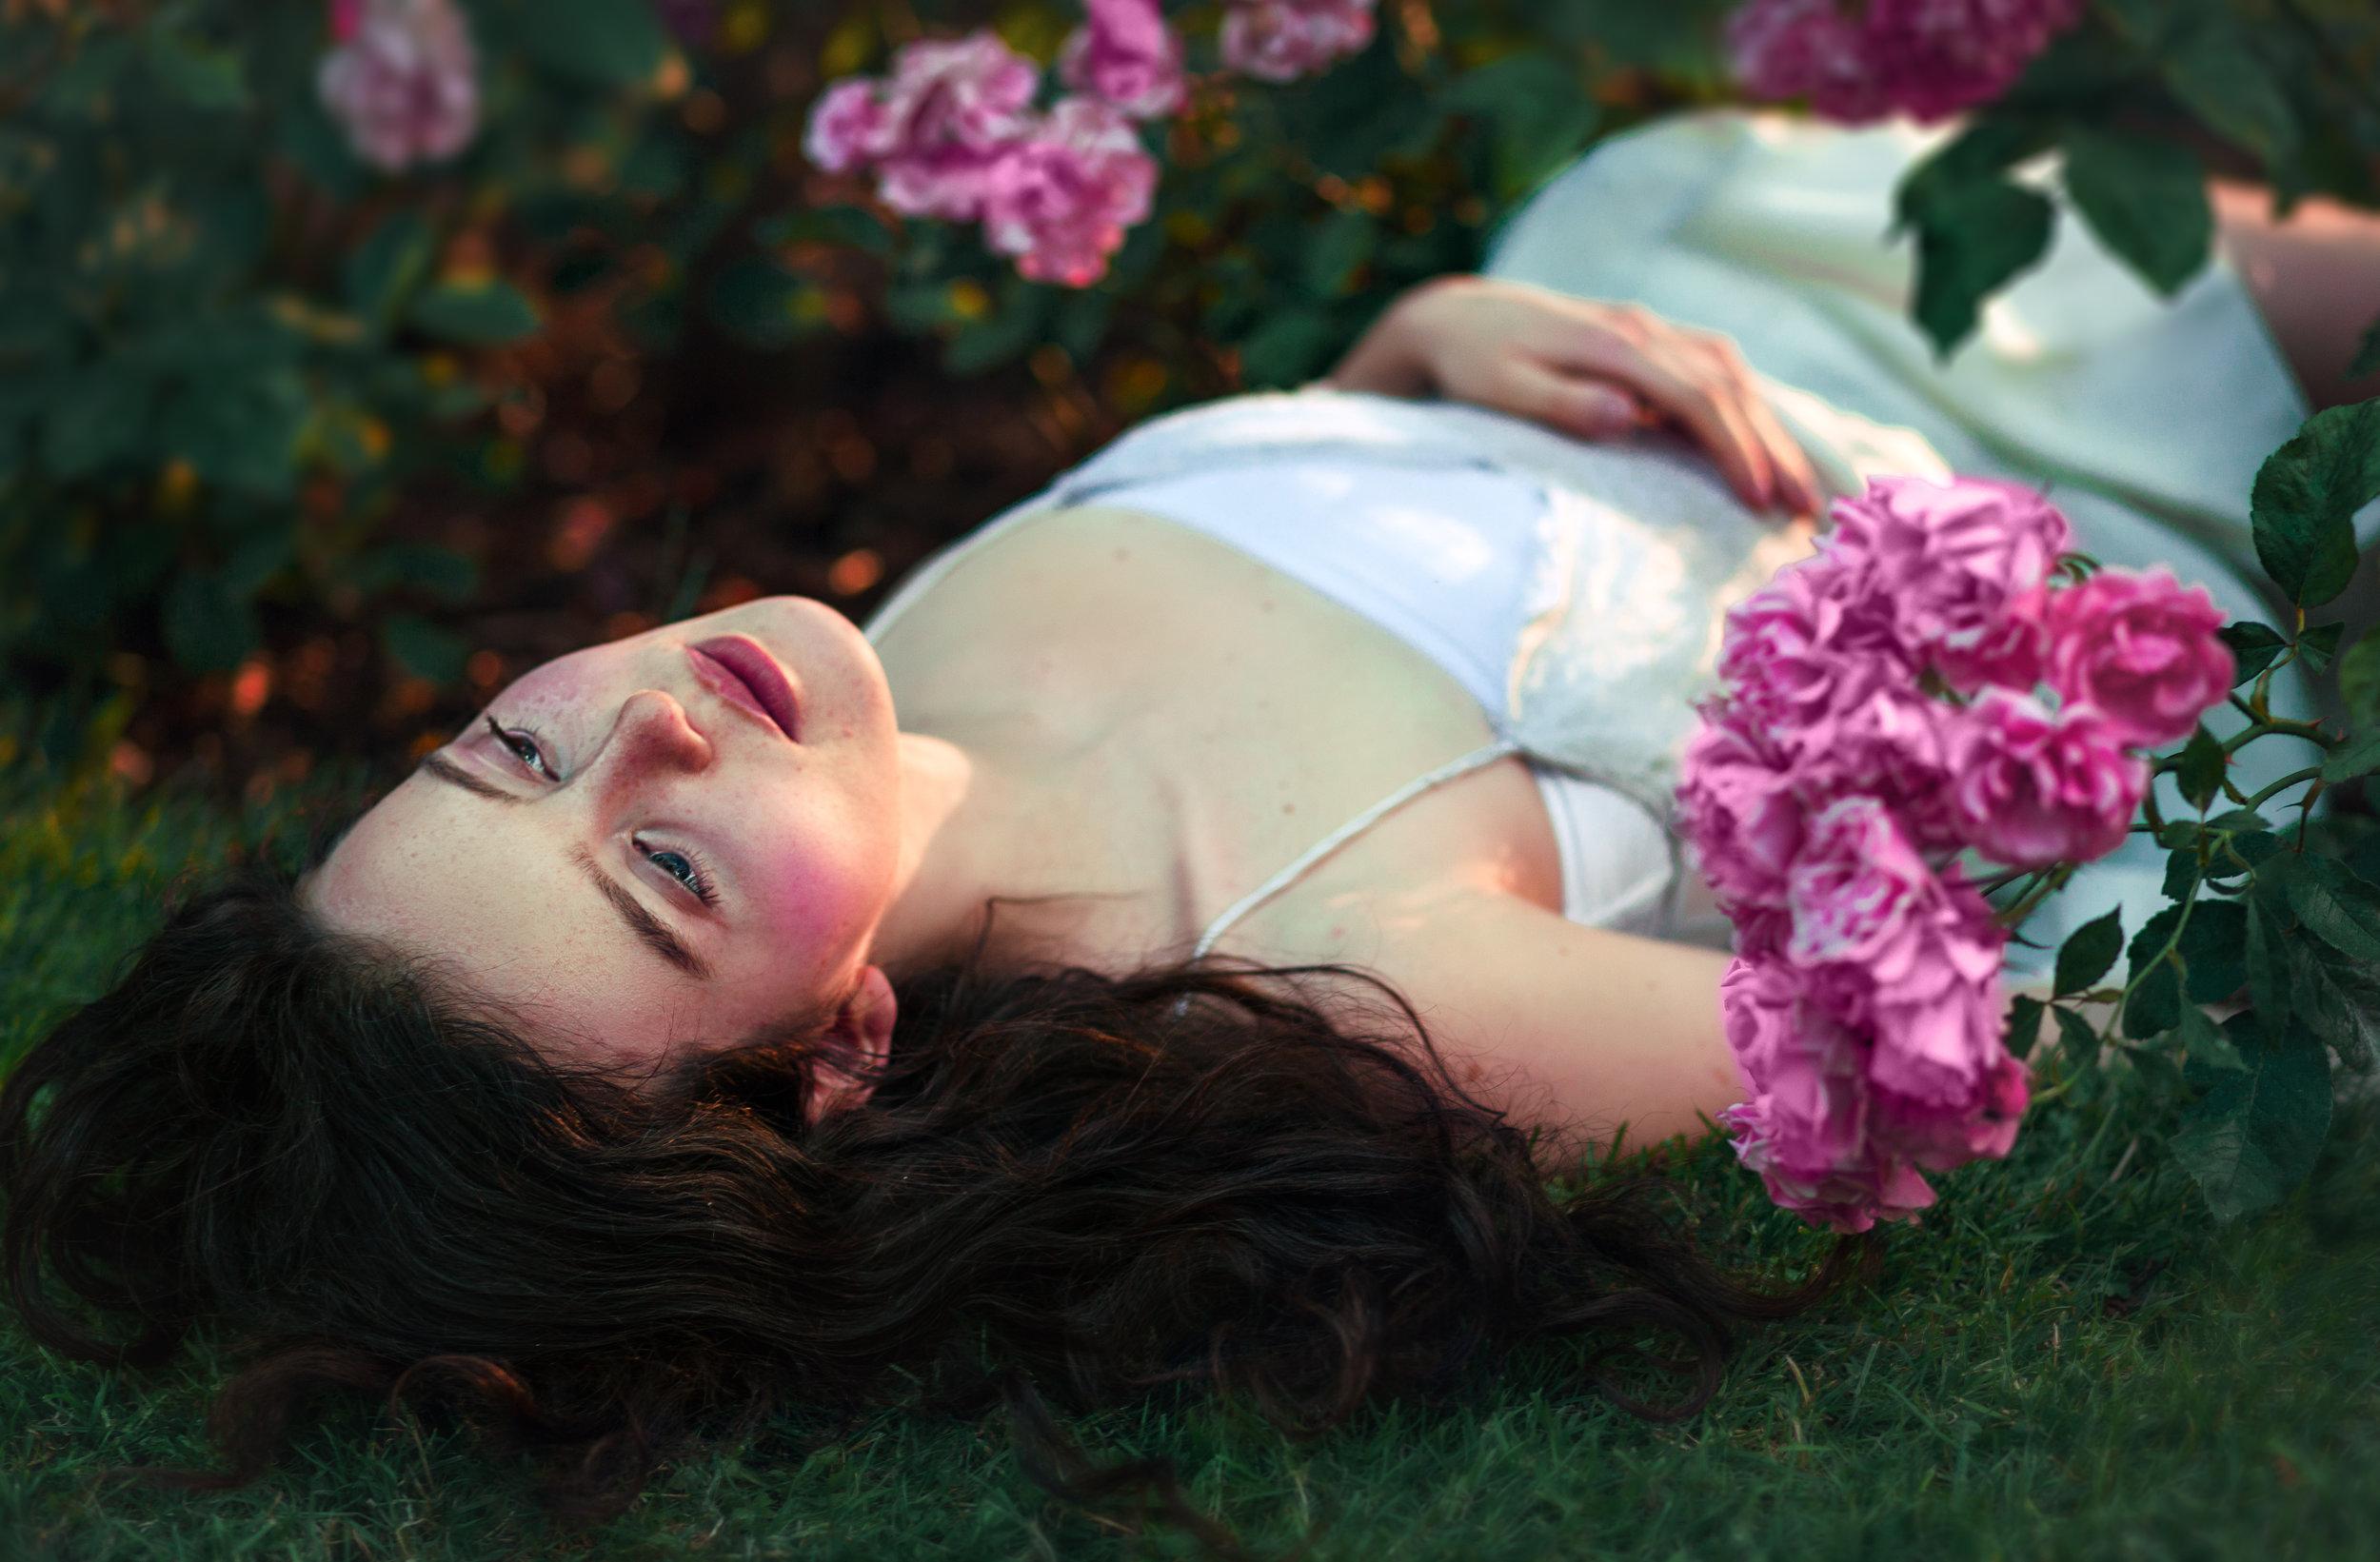 Vilde Joha in a pink rose bush